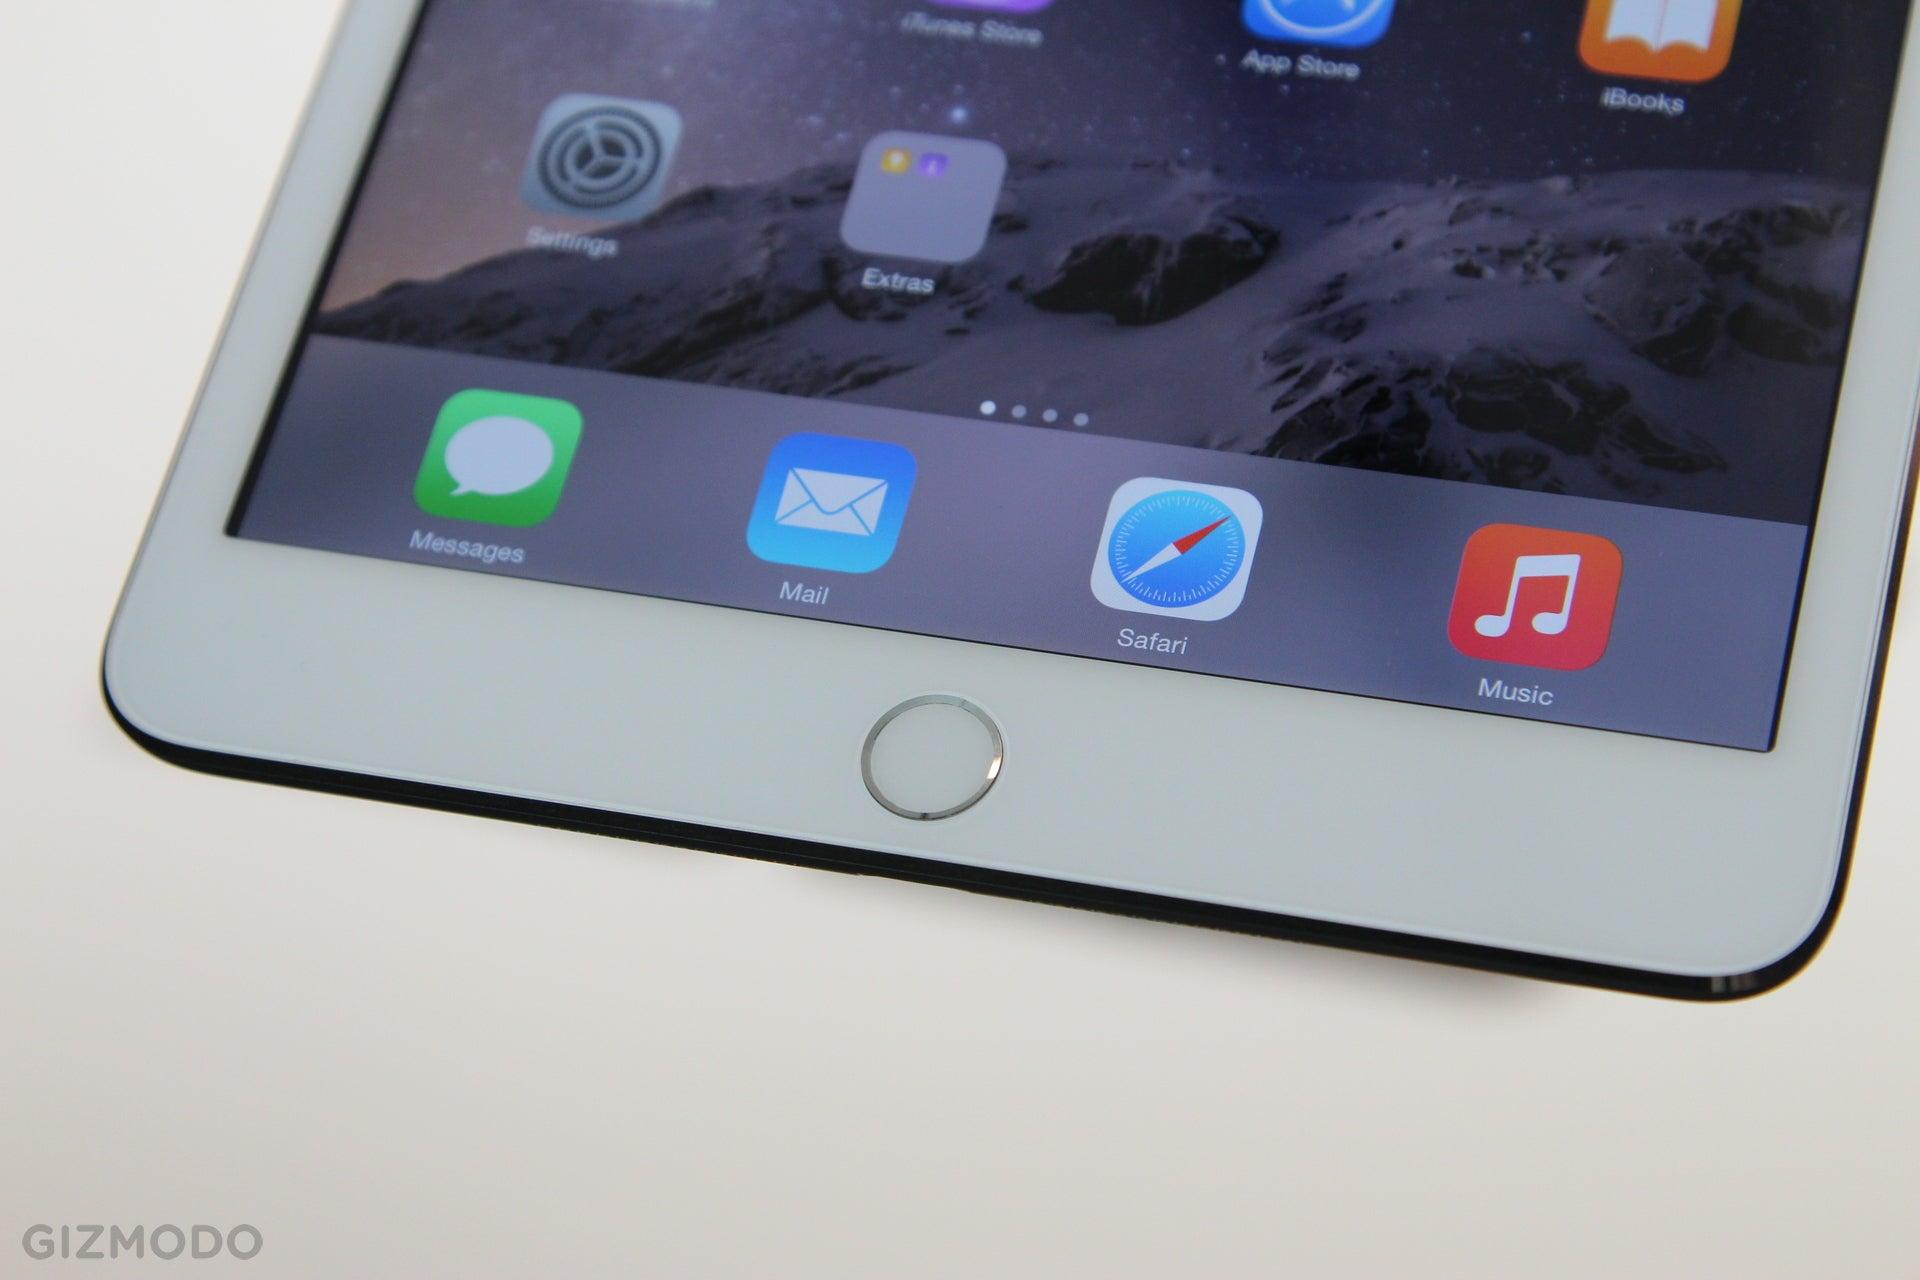 Ipad mini 2 release date in Australia